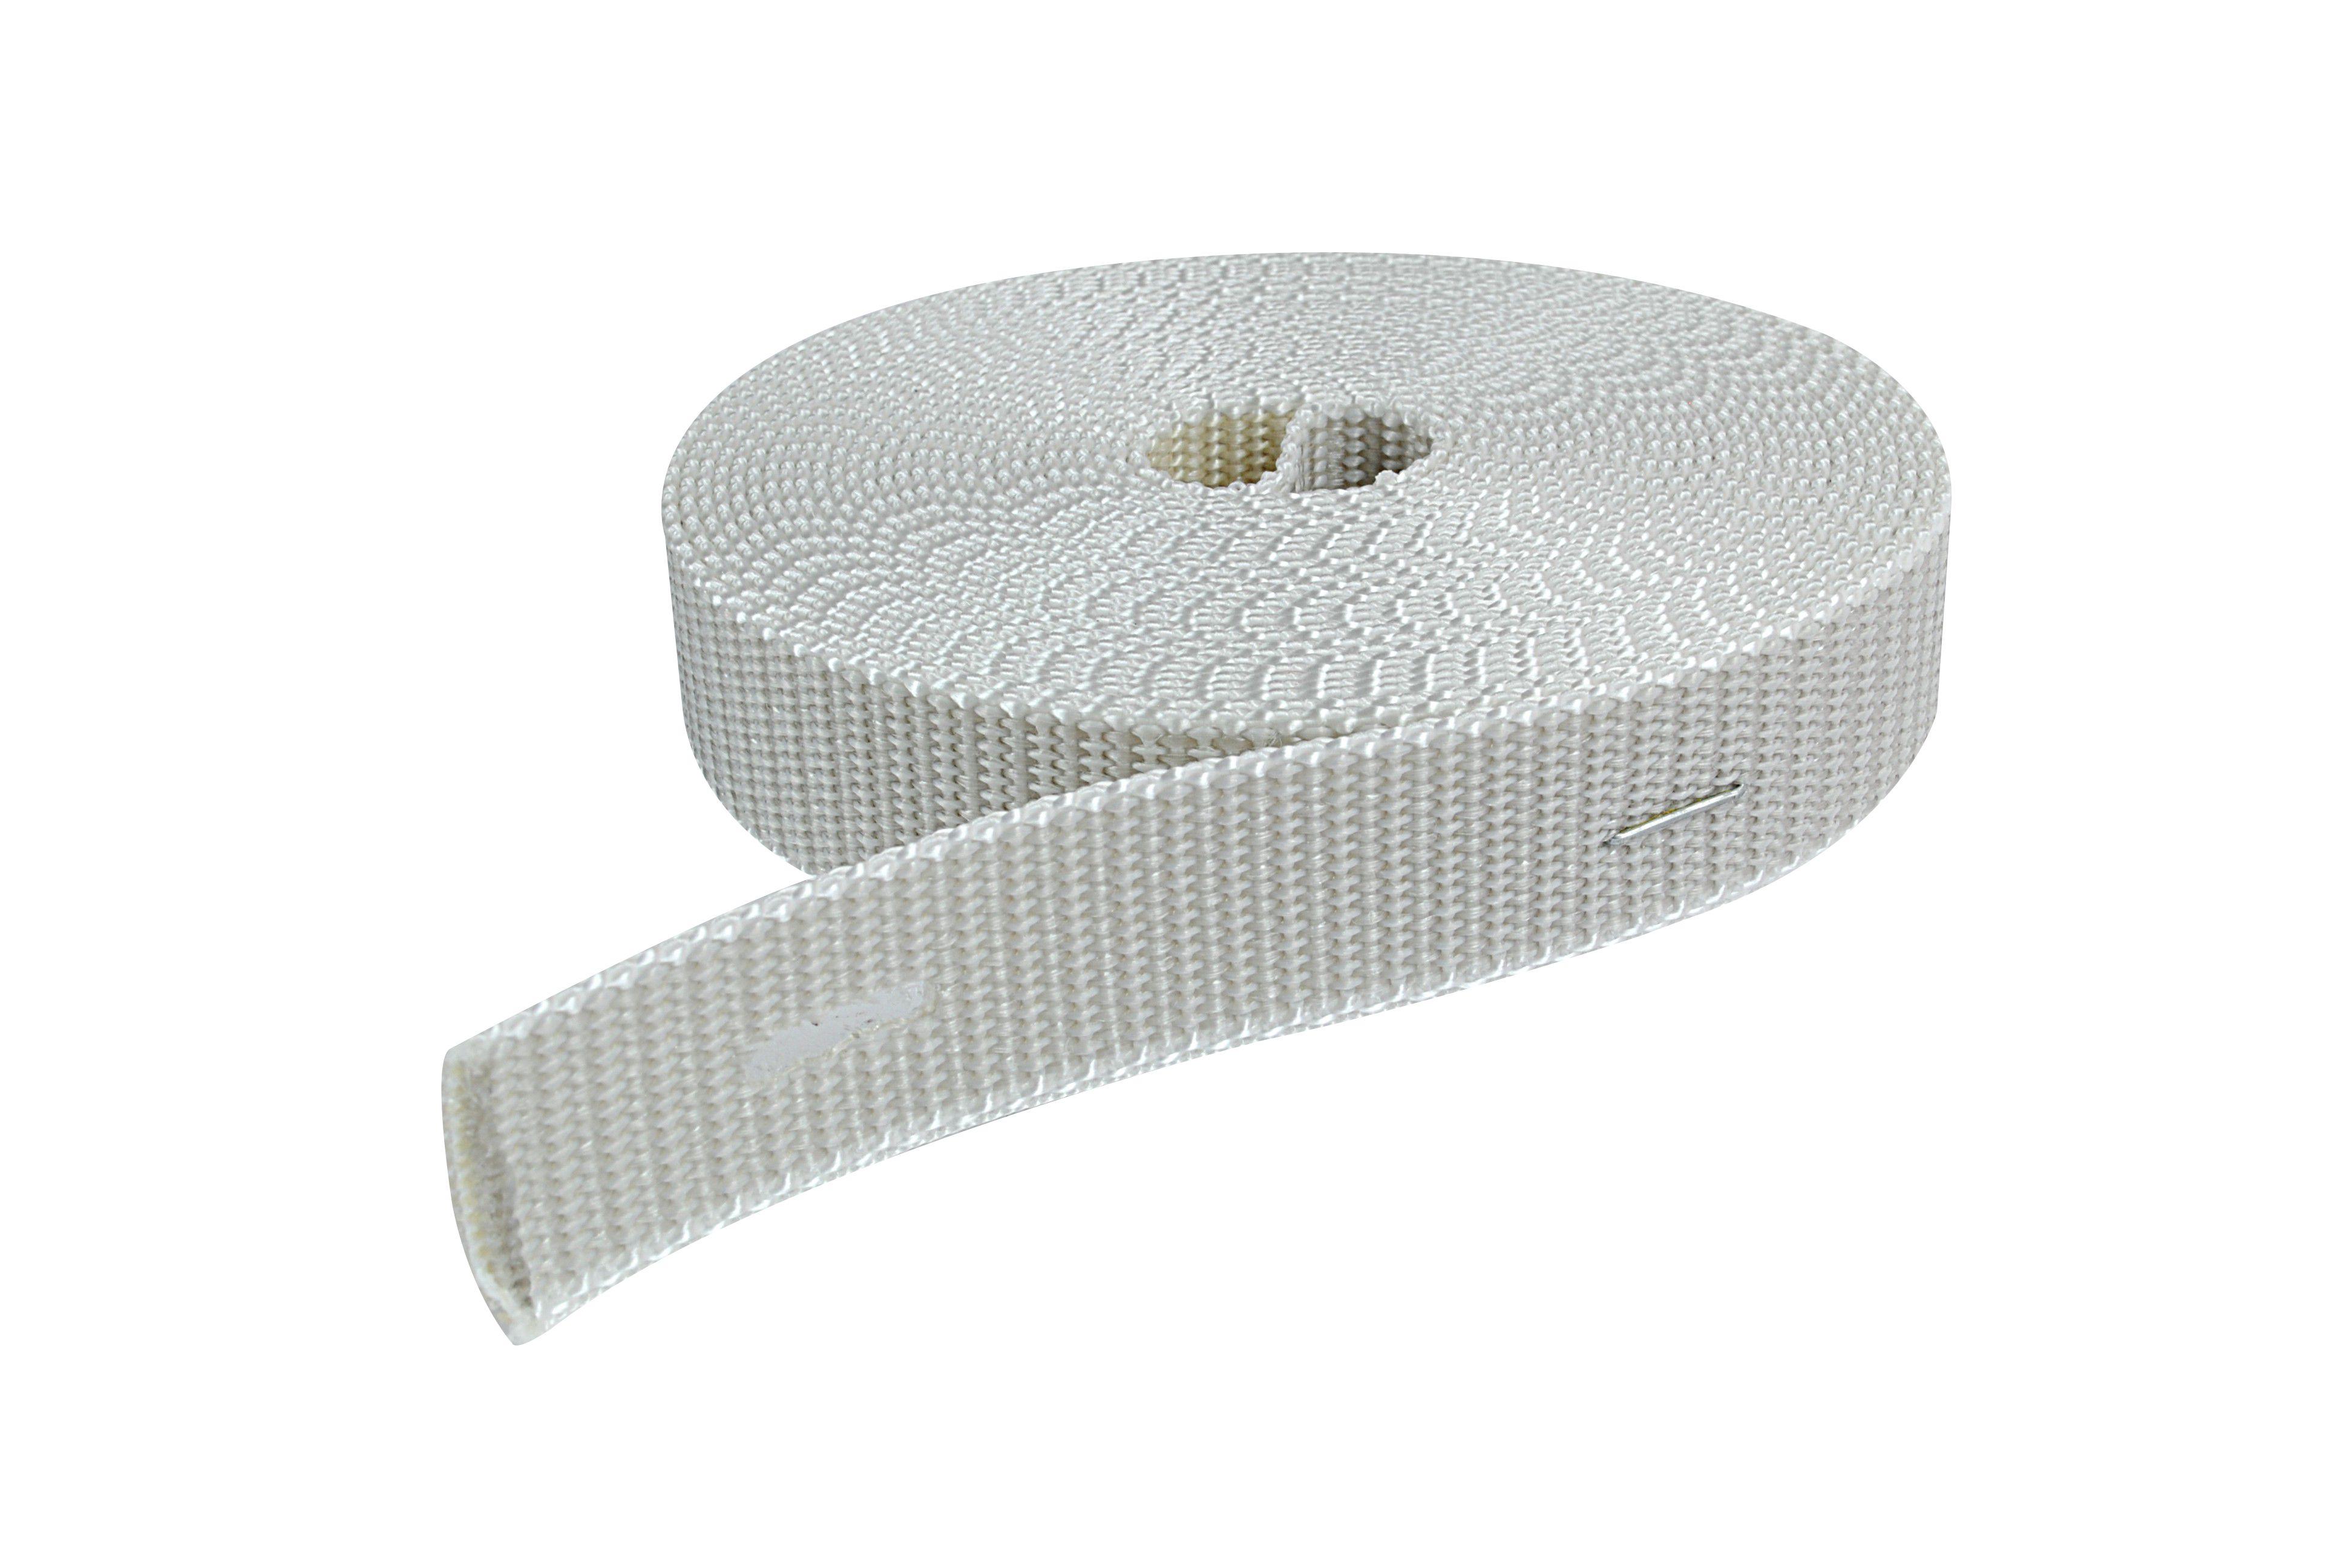 rollladengurt f r fenster 2 farbig beige hellgrau l nge neubau zubeh r sonstiges. Black Bedroom Furniture Sets. Home Design Ideas